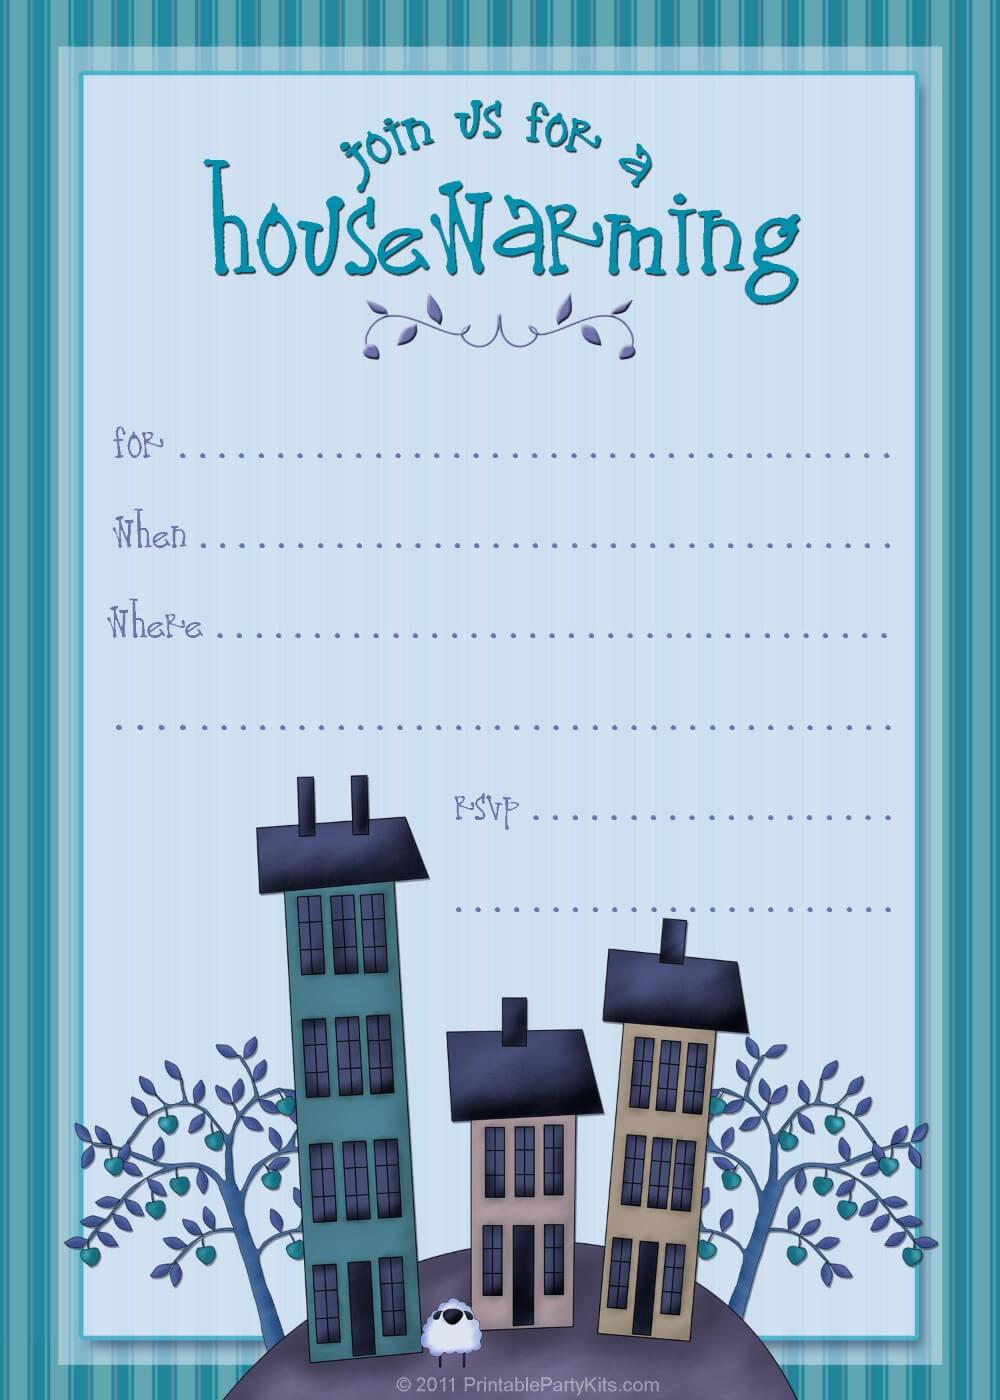 Free Housewarming Invitation Templates Template Awesome In Free Housewarming Invitation Card Template